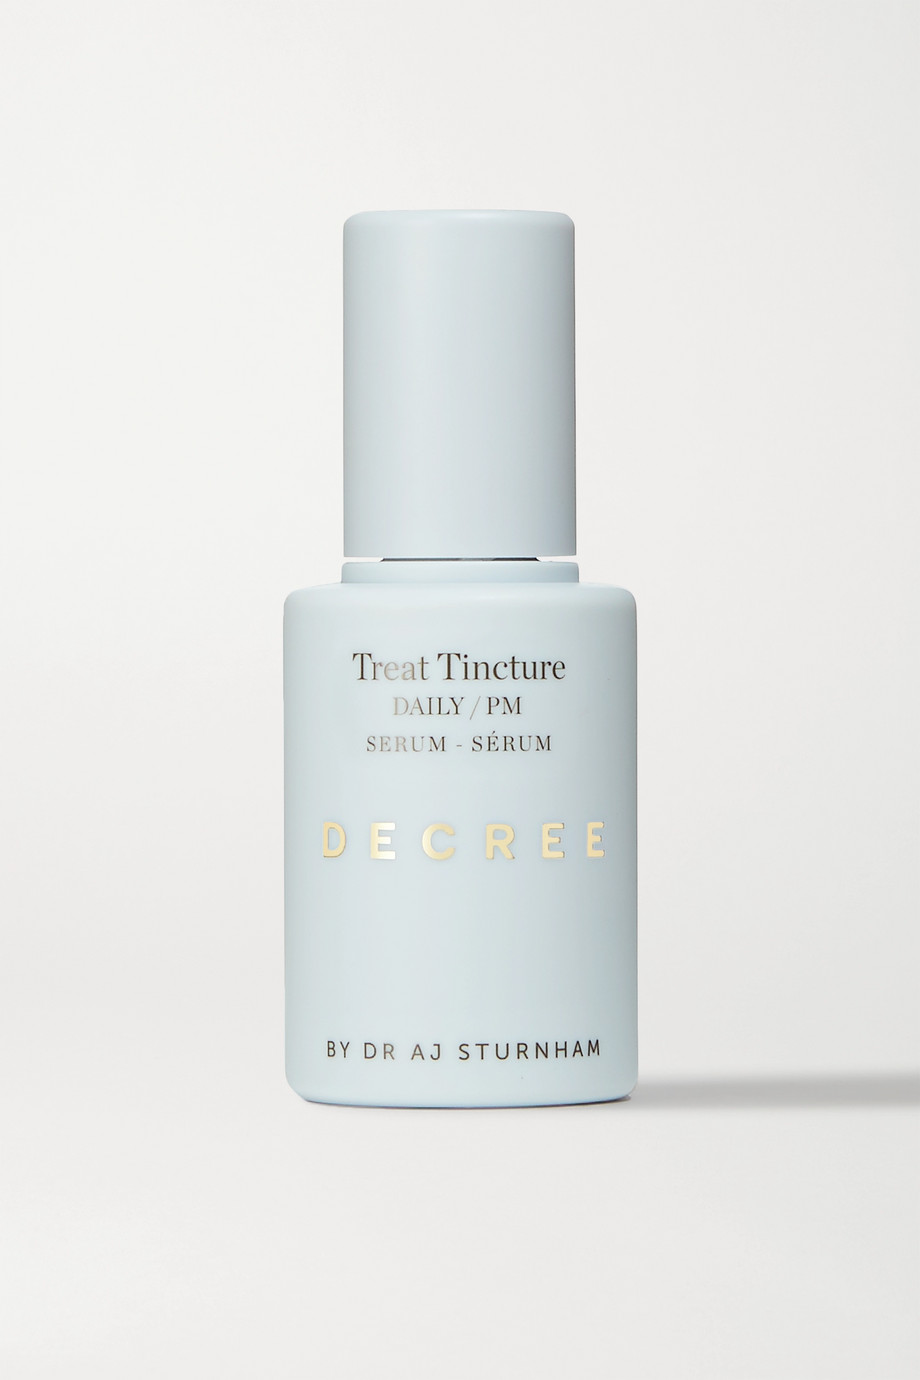 Decree Treat Tincture, 30ml